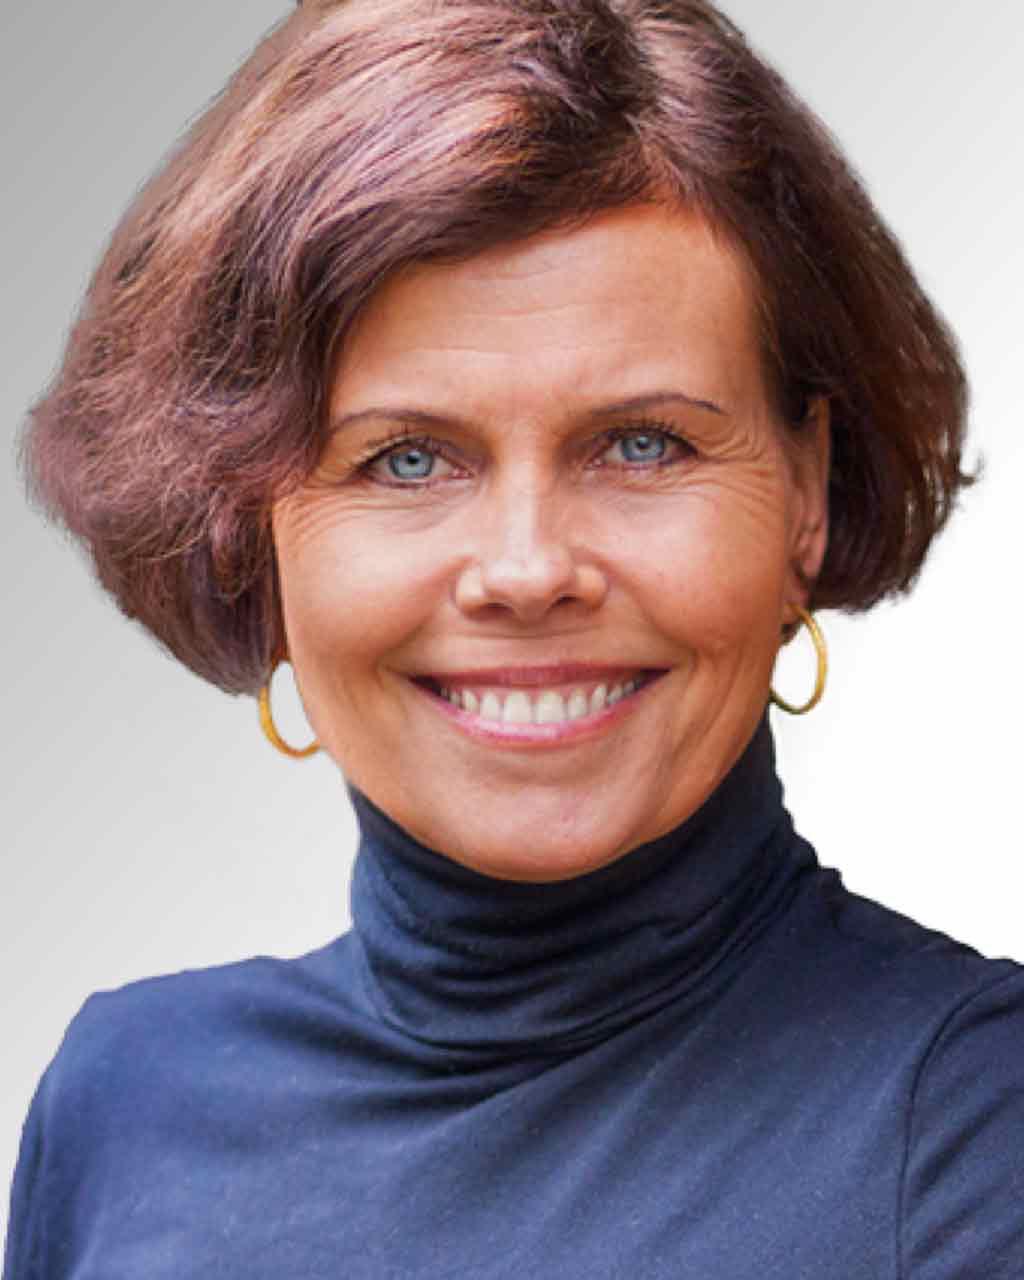 Birgitte-Testimonial.jpg